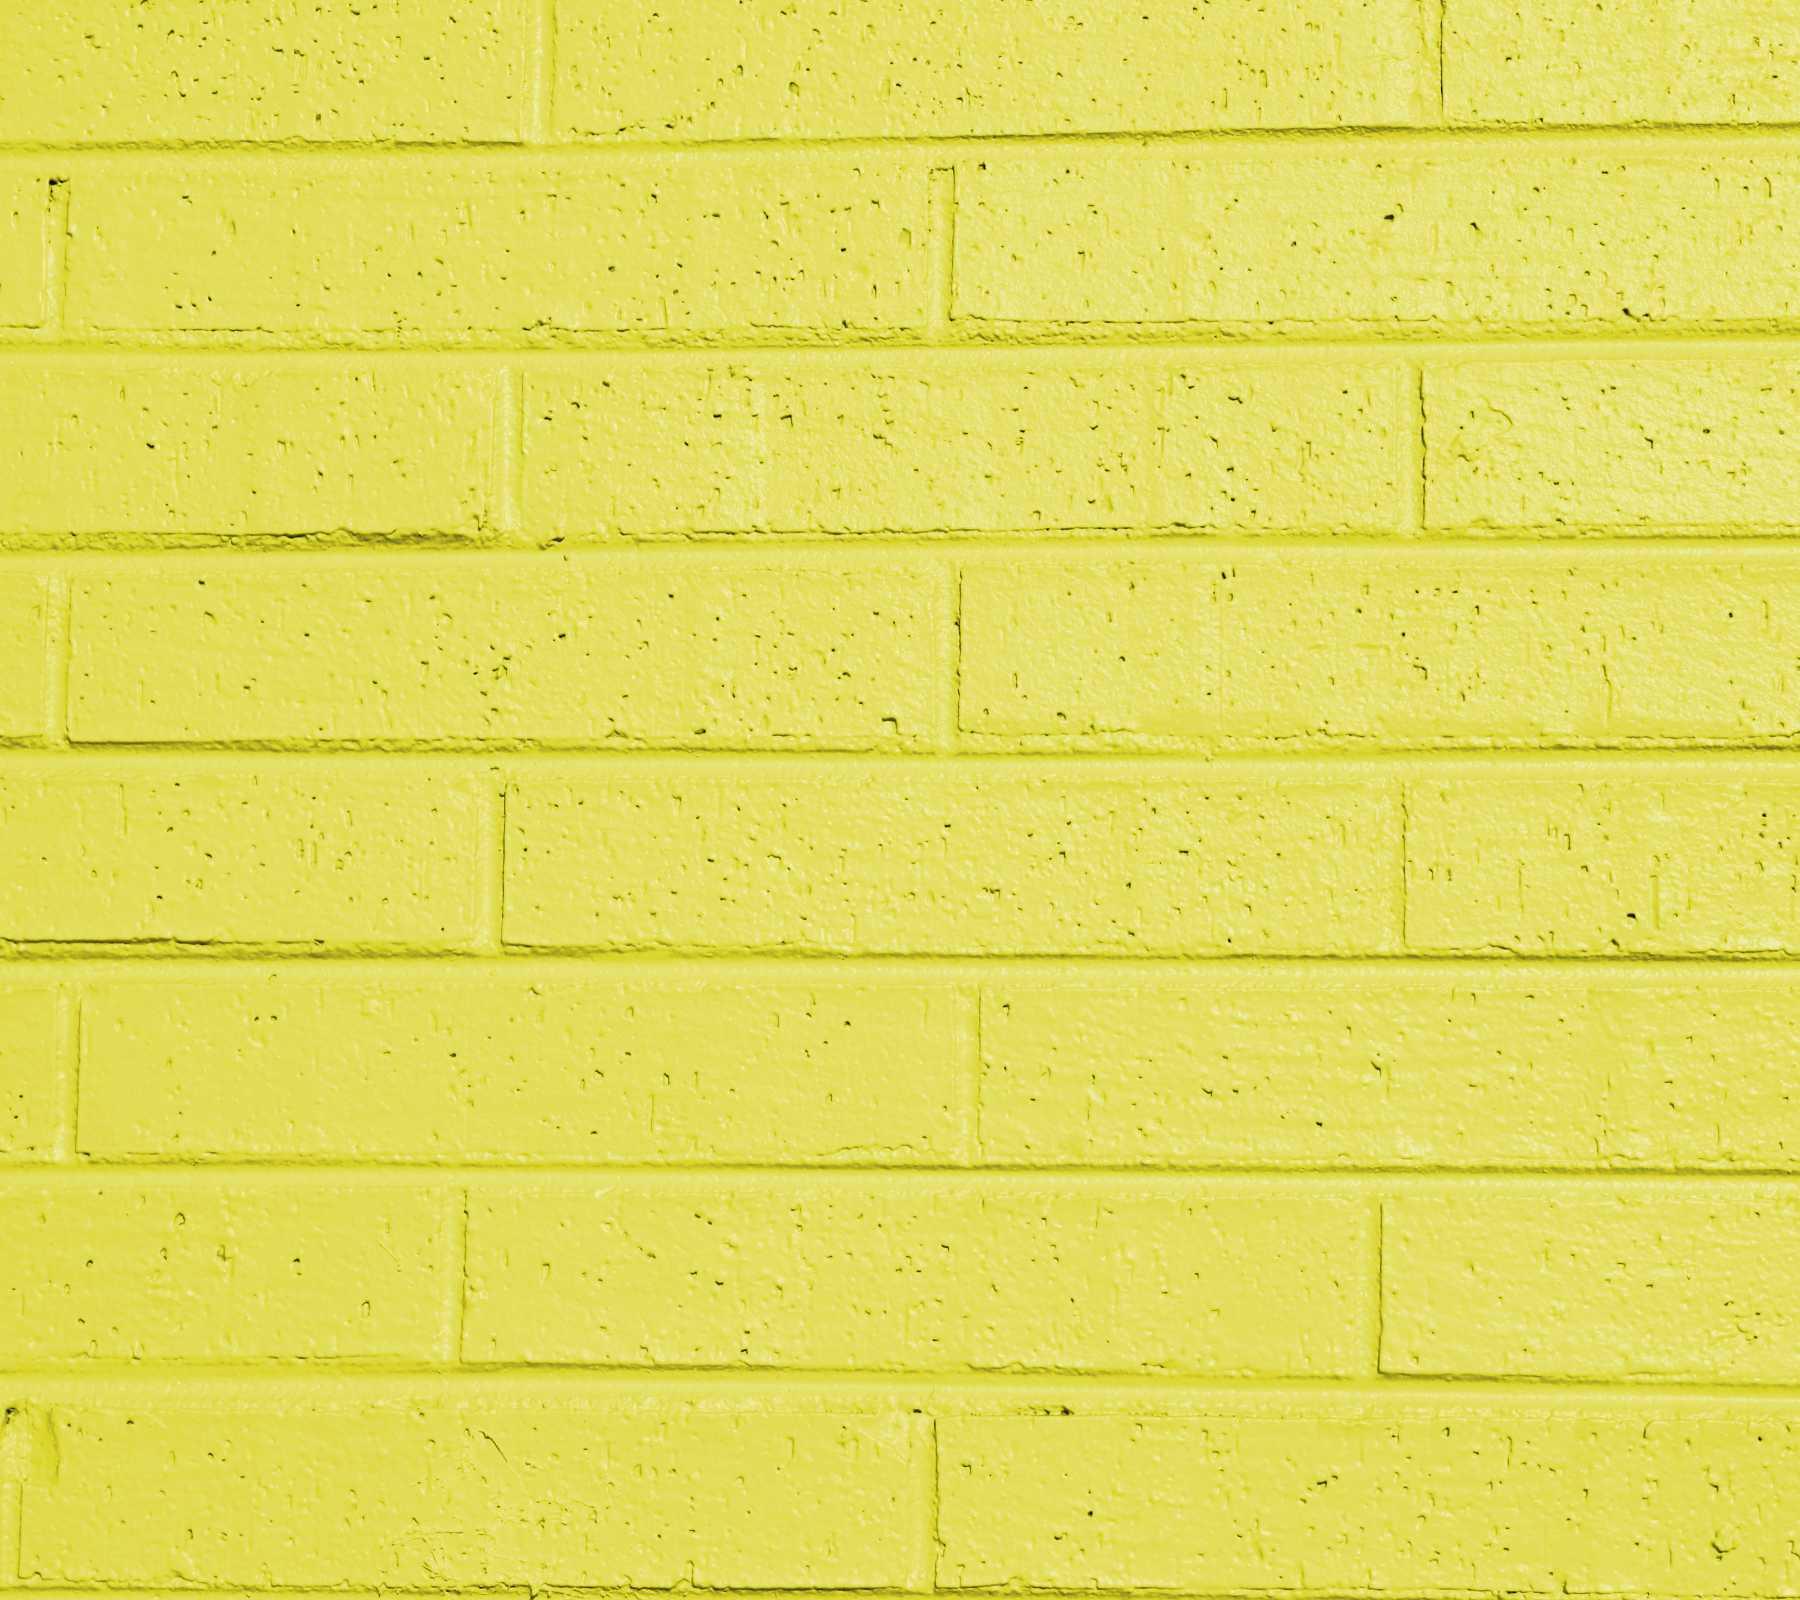 Yellow Painted Brick Wall 1800x1600 Background Image